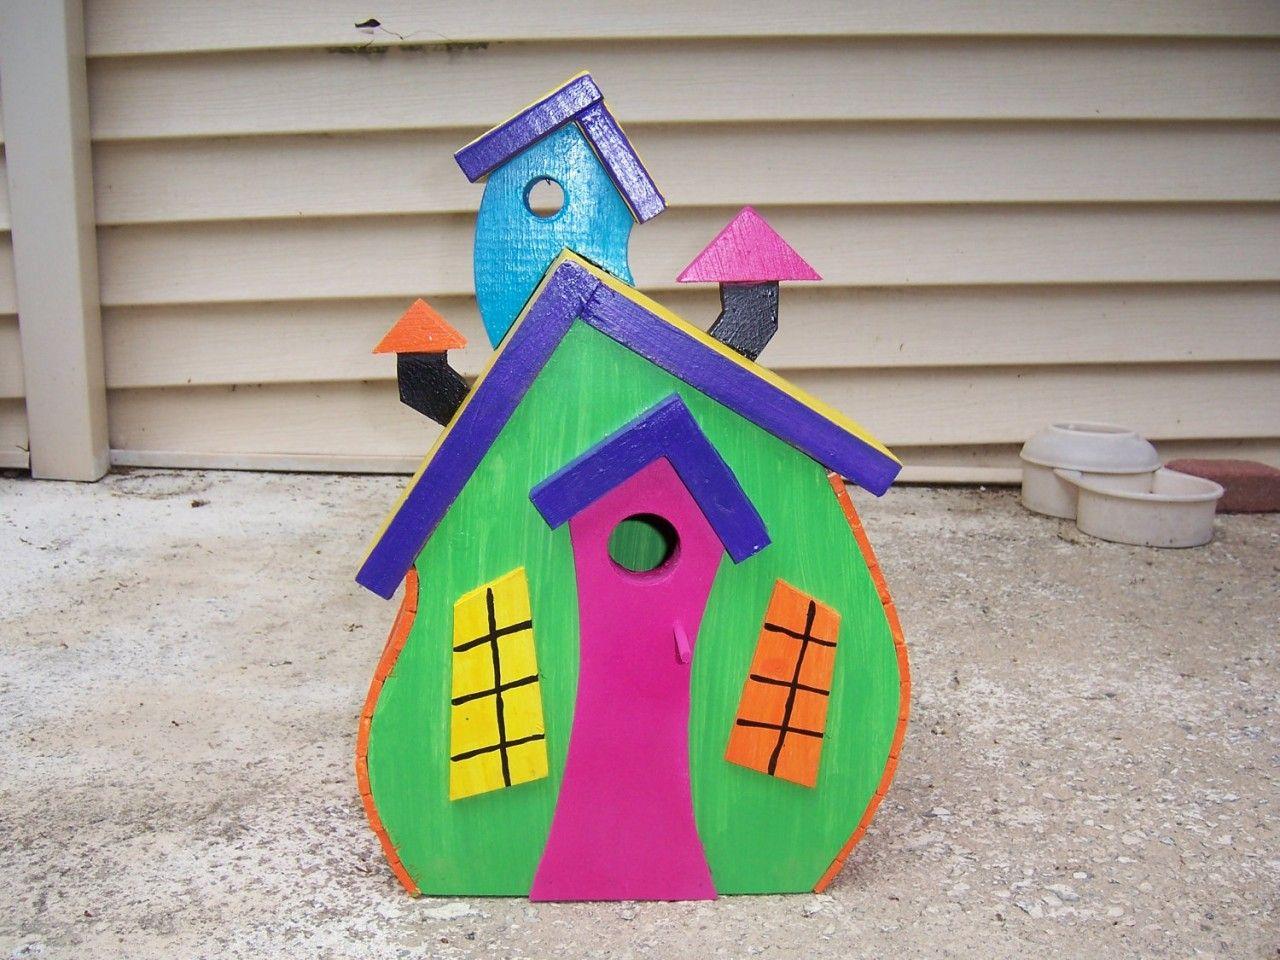 6accd3fd66f2f6aa171cd296e02cb4f5 Bluebird House Plan on bluebird of happiness, nest box plans, bluebird building plans, bluebird habitat, bluebird houses product, bluebird art, bluebird birdhouse dimensions, bluebird silhouette, bluebird feeders, bird boxes plans, bluebird tattoo, bluebird fledgling, bluebird territory, bluebird nest, bluebird boxes plans, bluebird stained glass, oriole feeder plans, gazebo plans, bird feeder plans, bluebird birdhouse patterns blueprints,